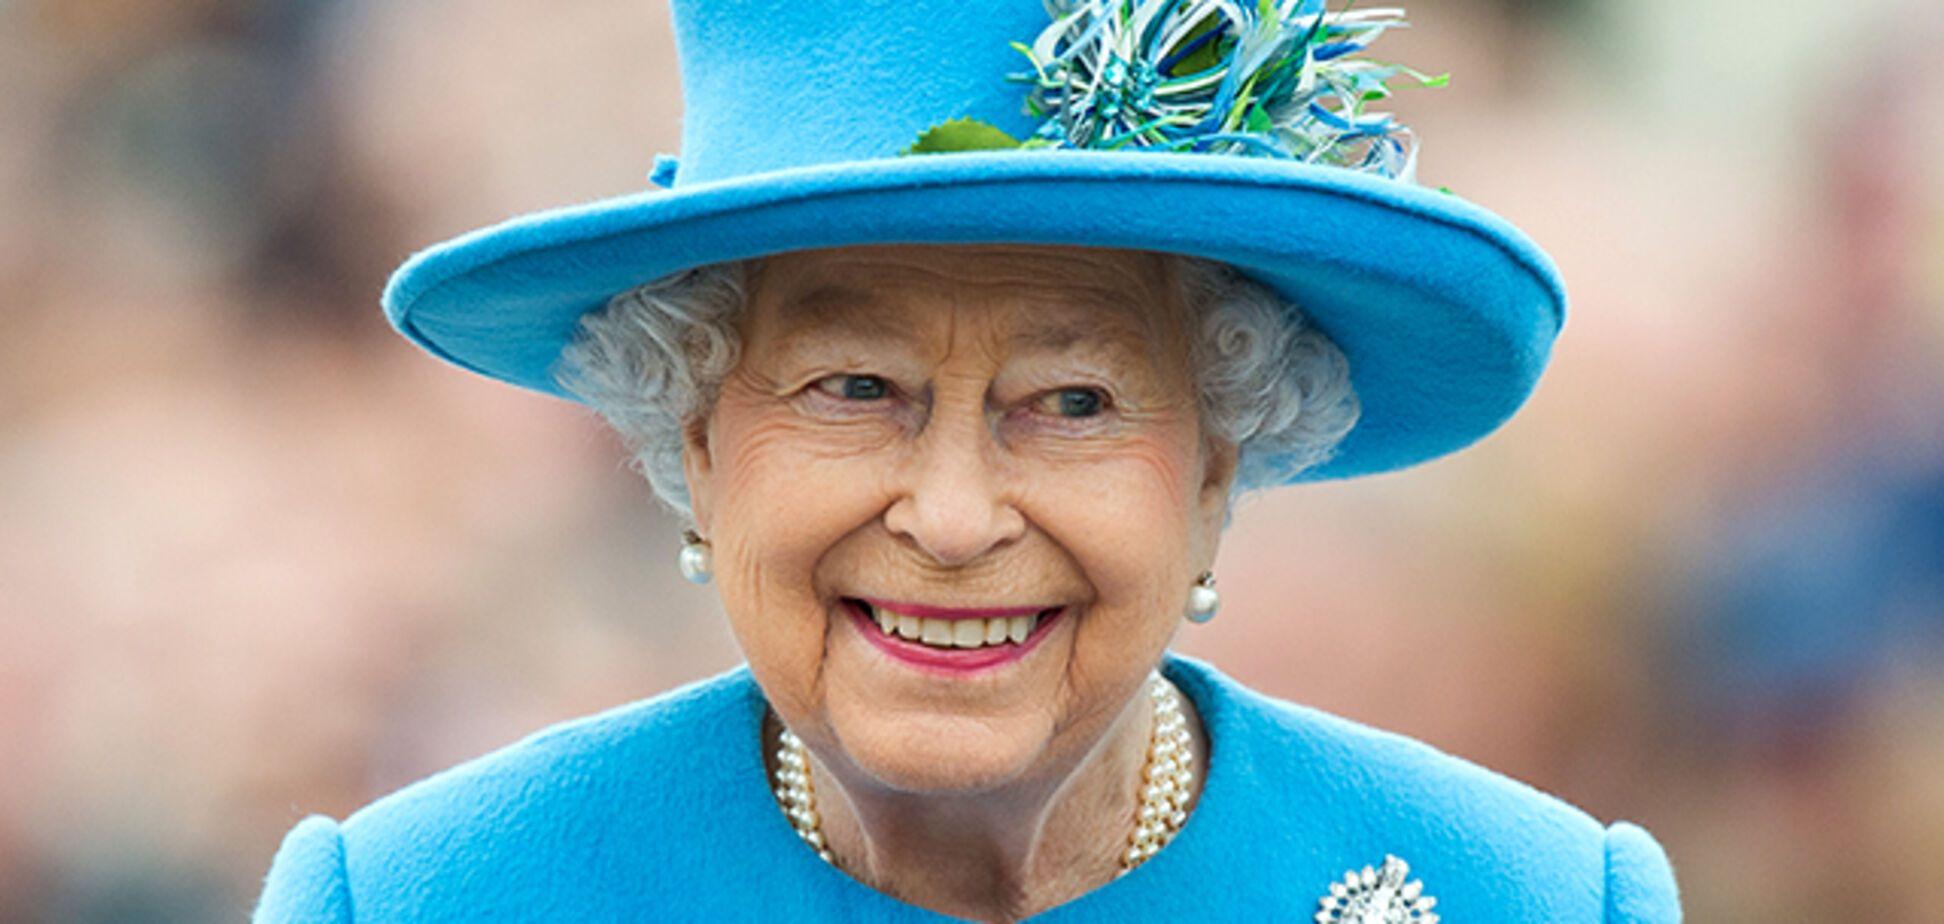 Елизавета ІІ посетила скачки